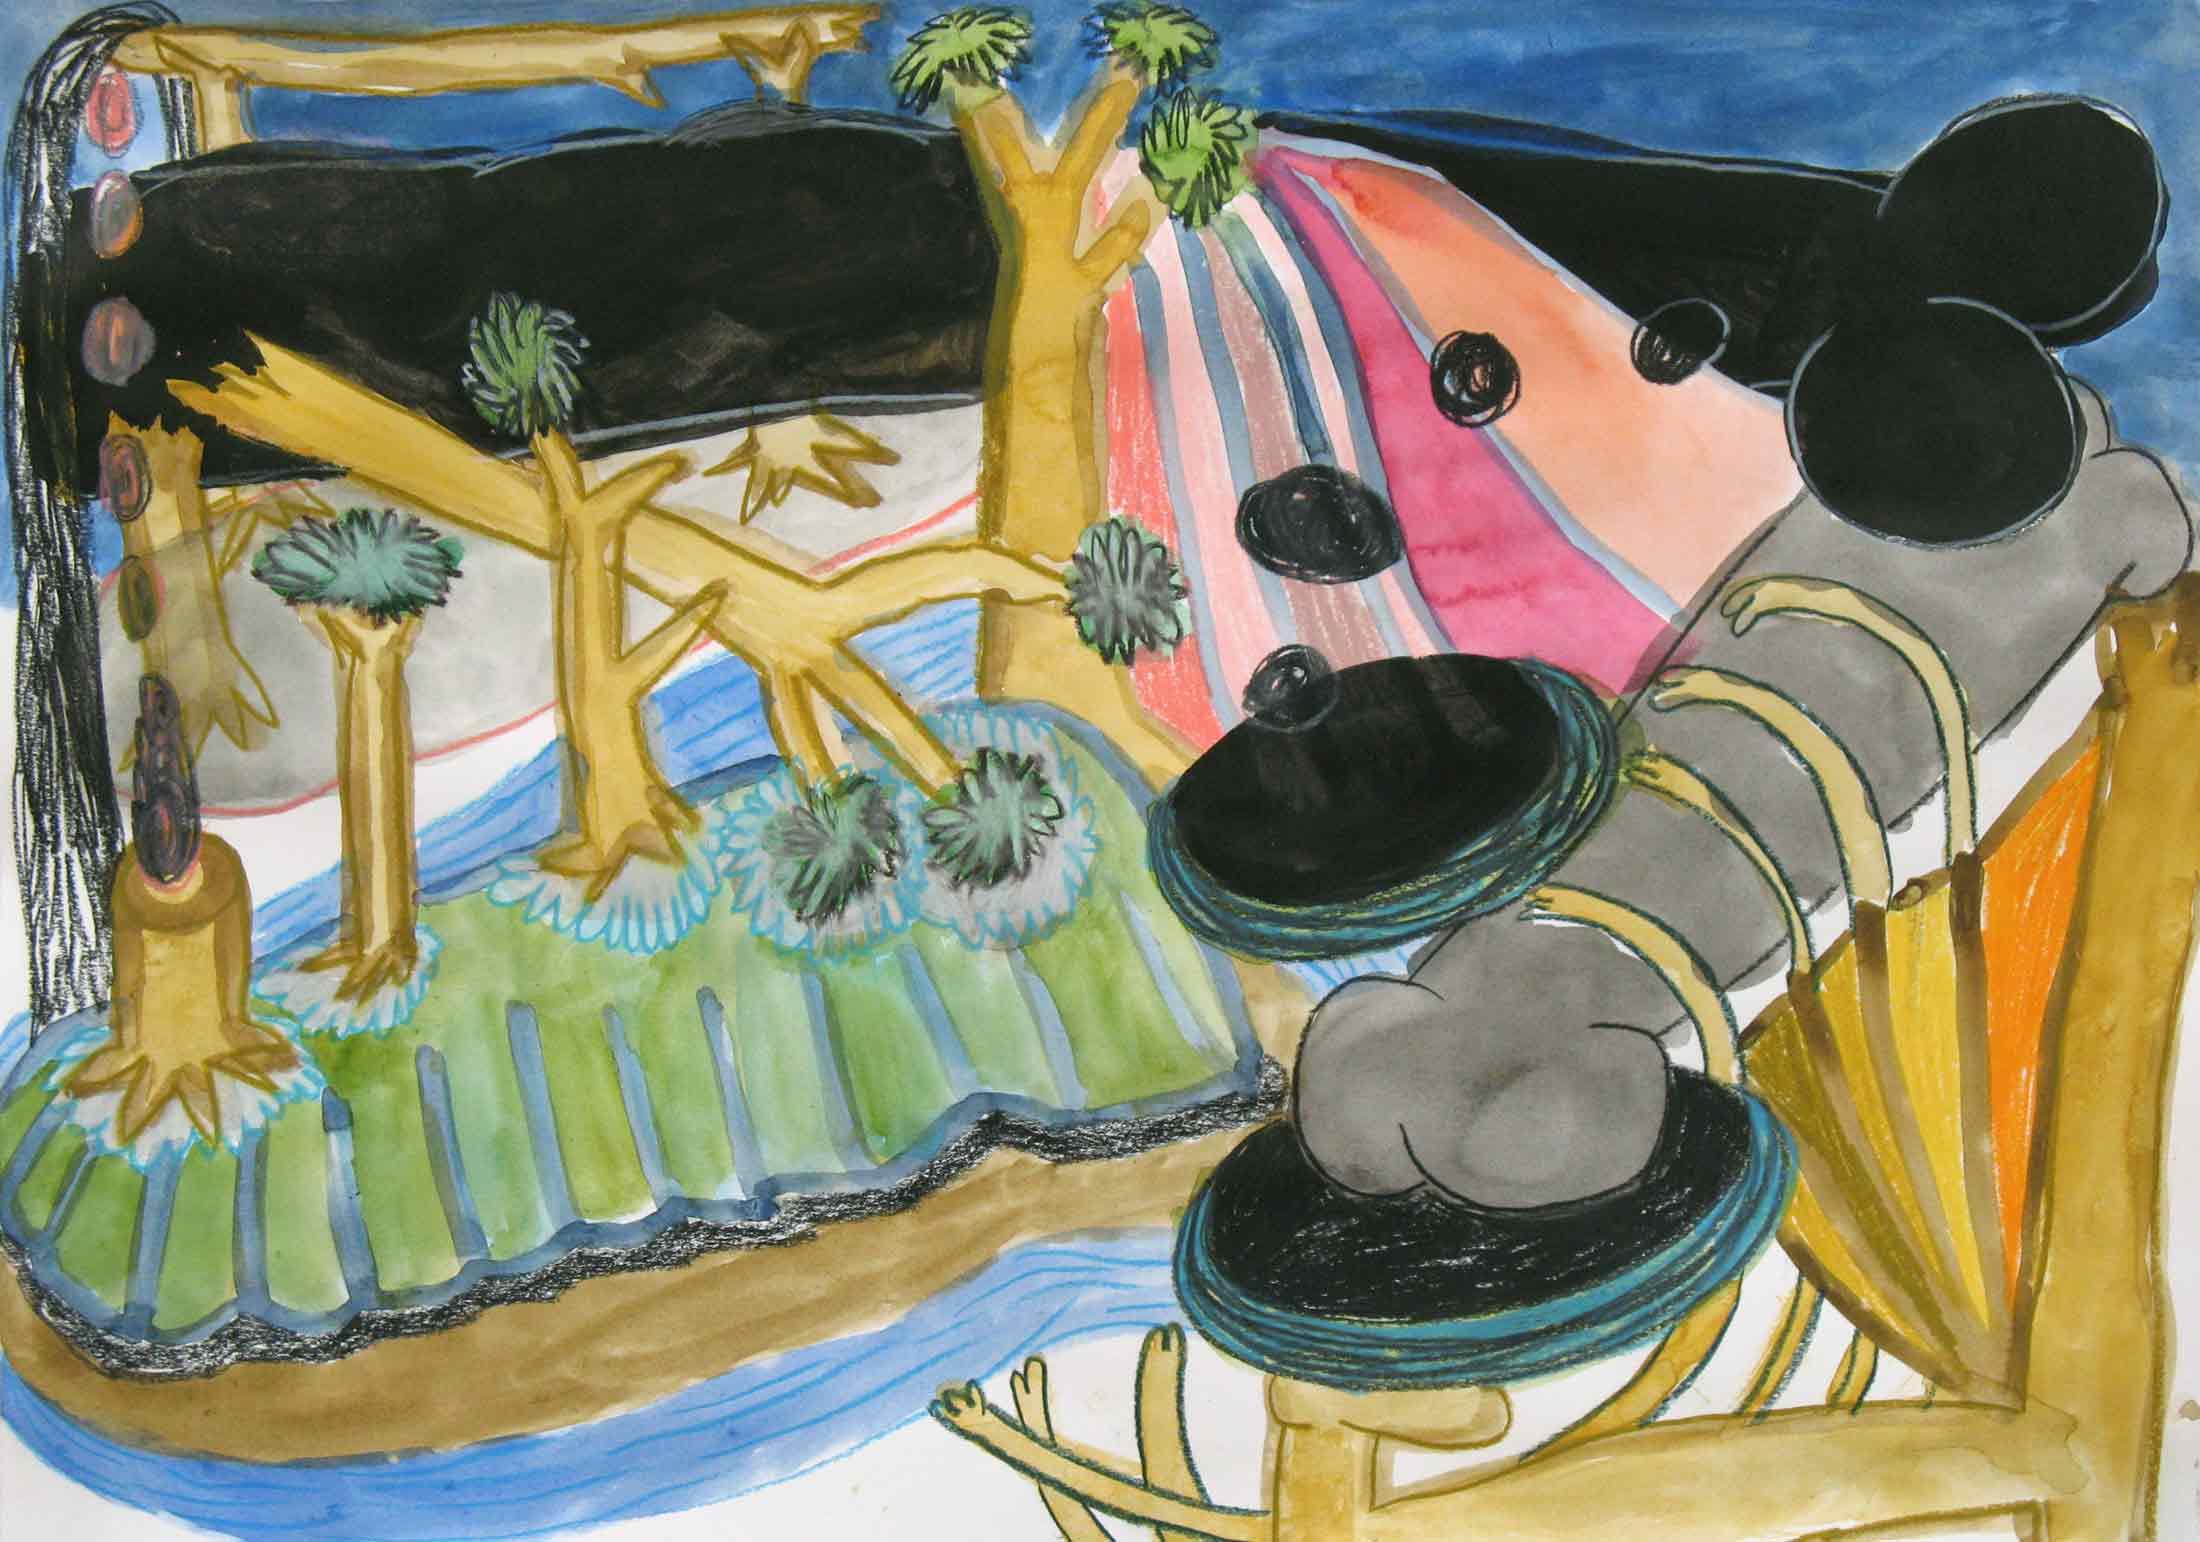 Uit de serie  La tombe des tombeurs  potlood, inkt, gouache, aquarel 29 x 42 cm, 2014